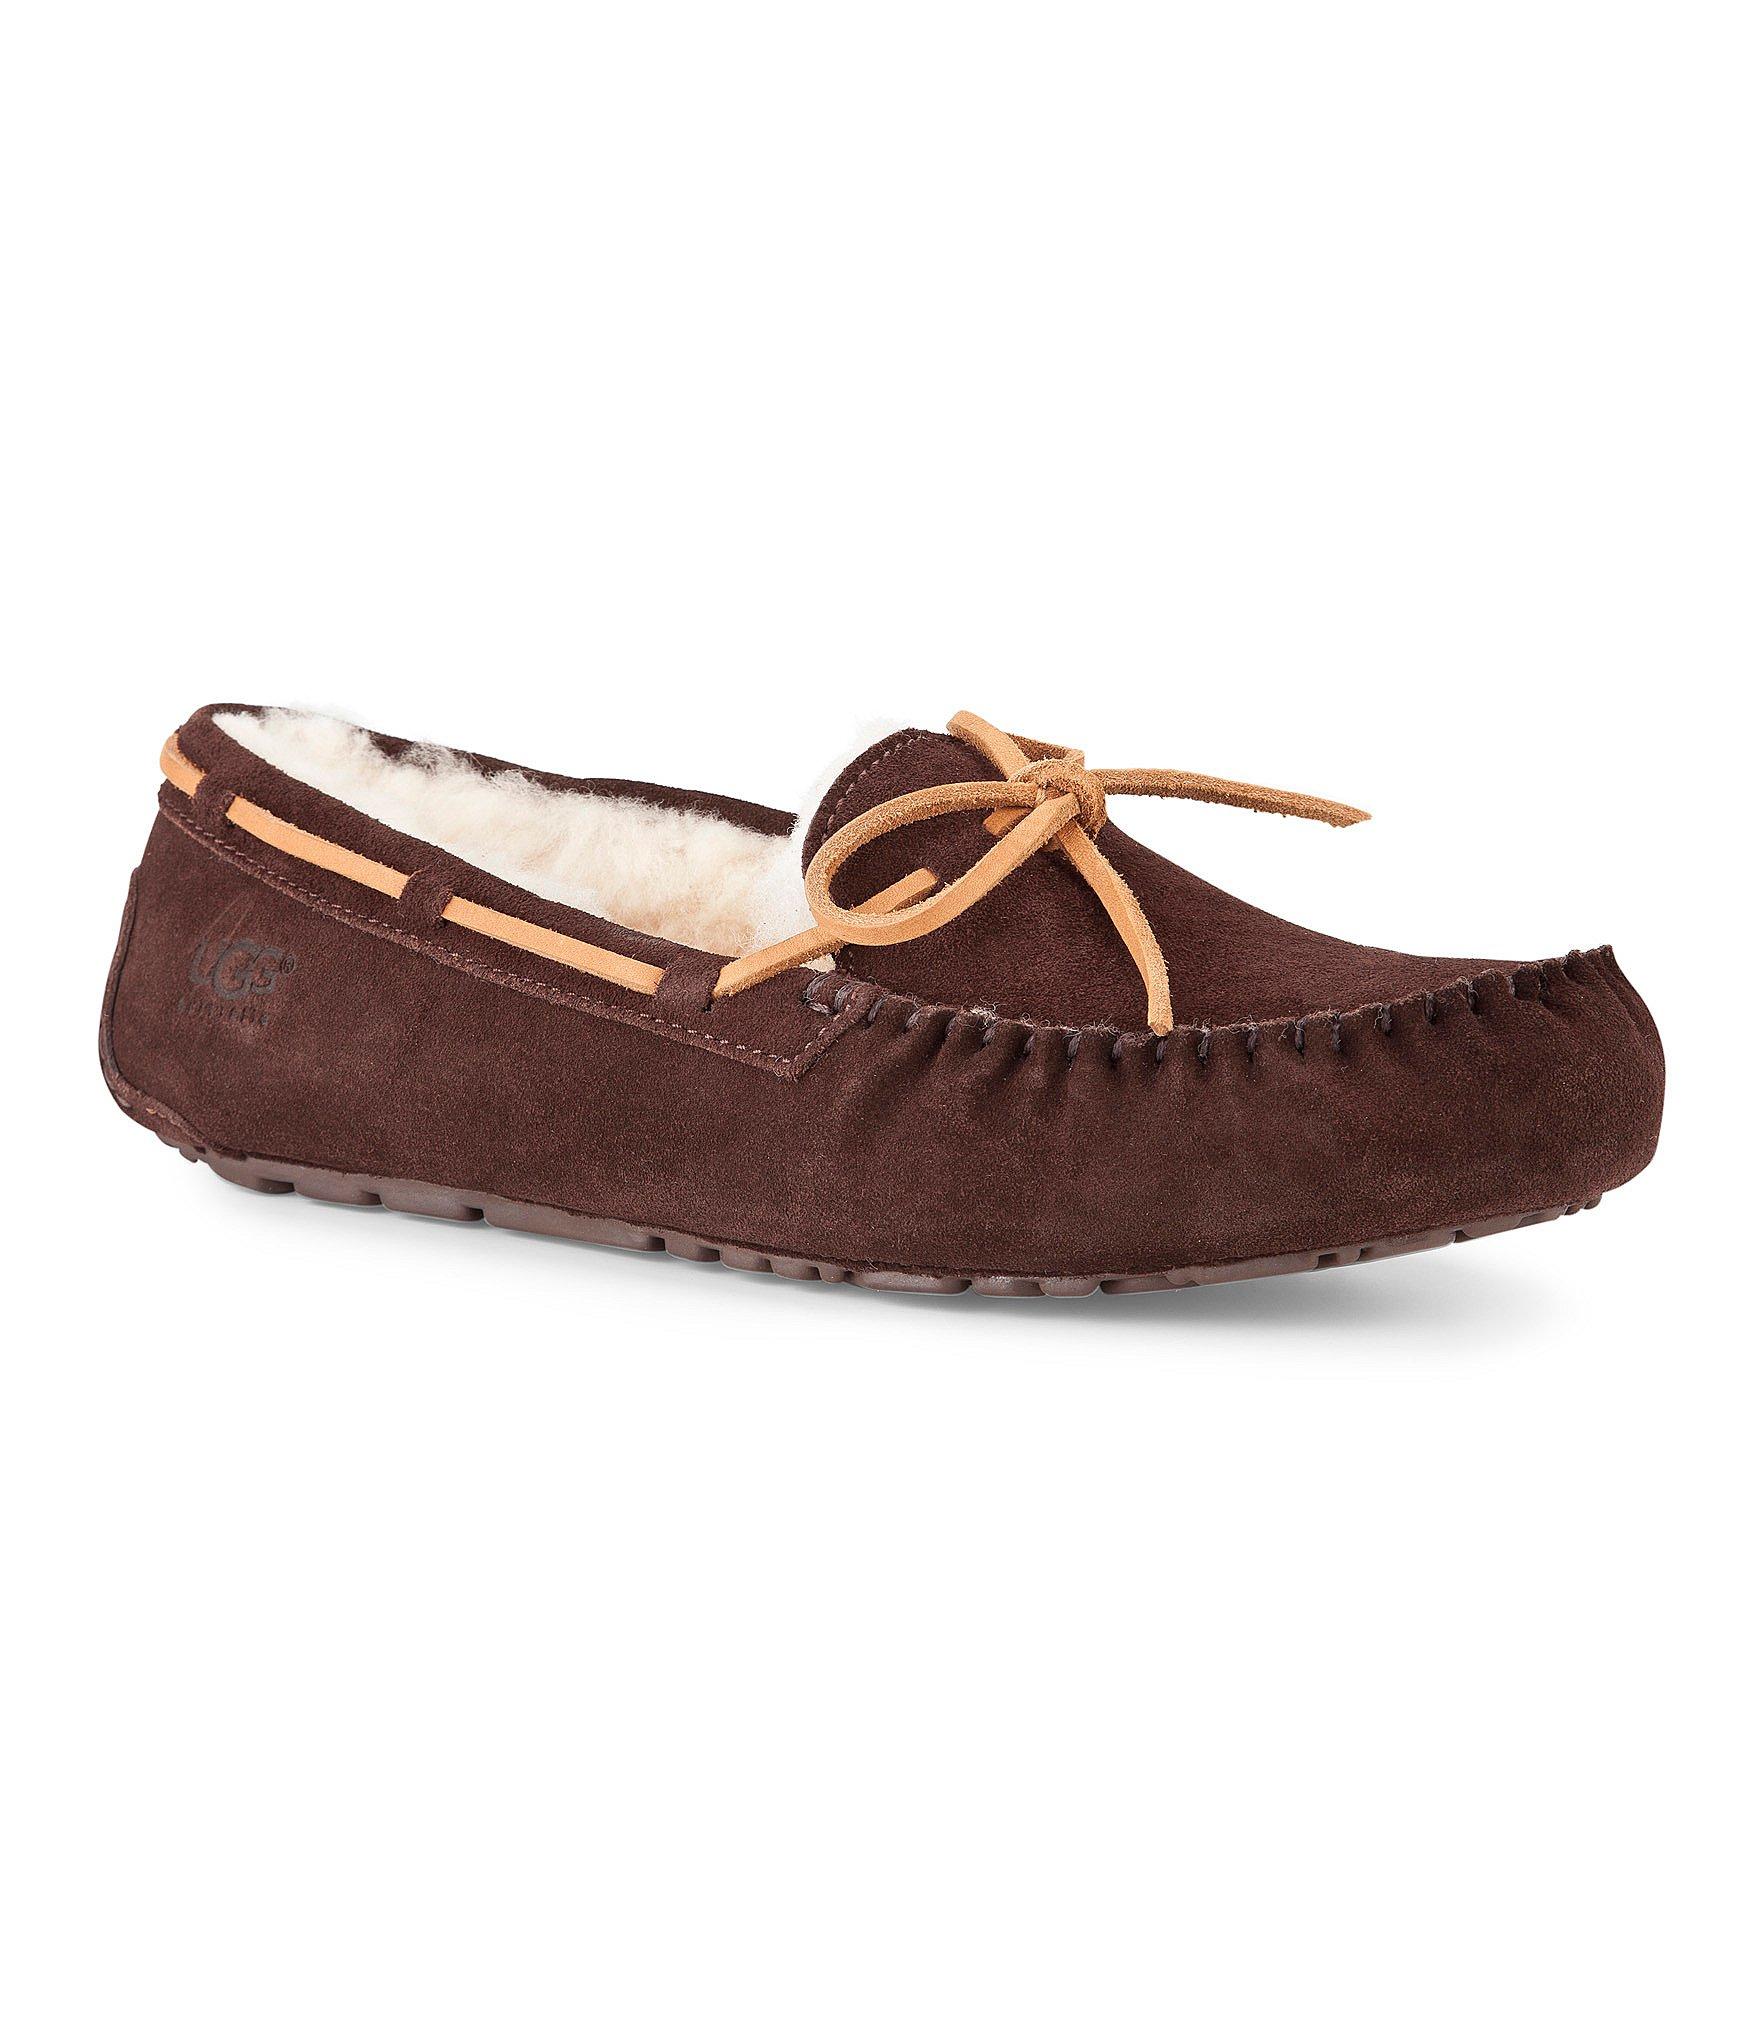 ugg slippers dillards